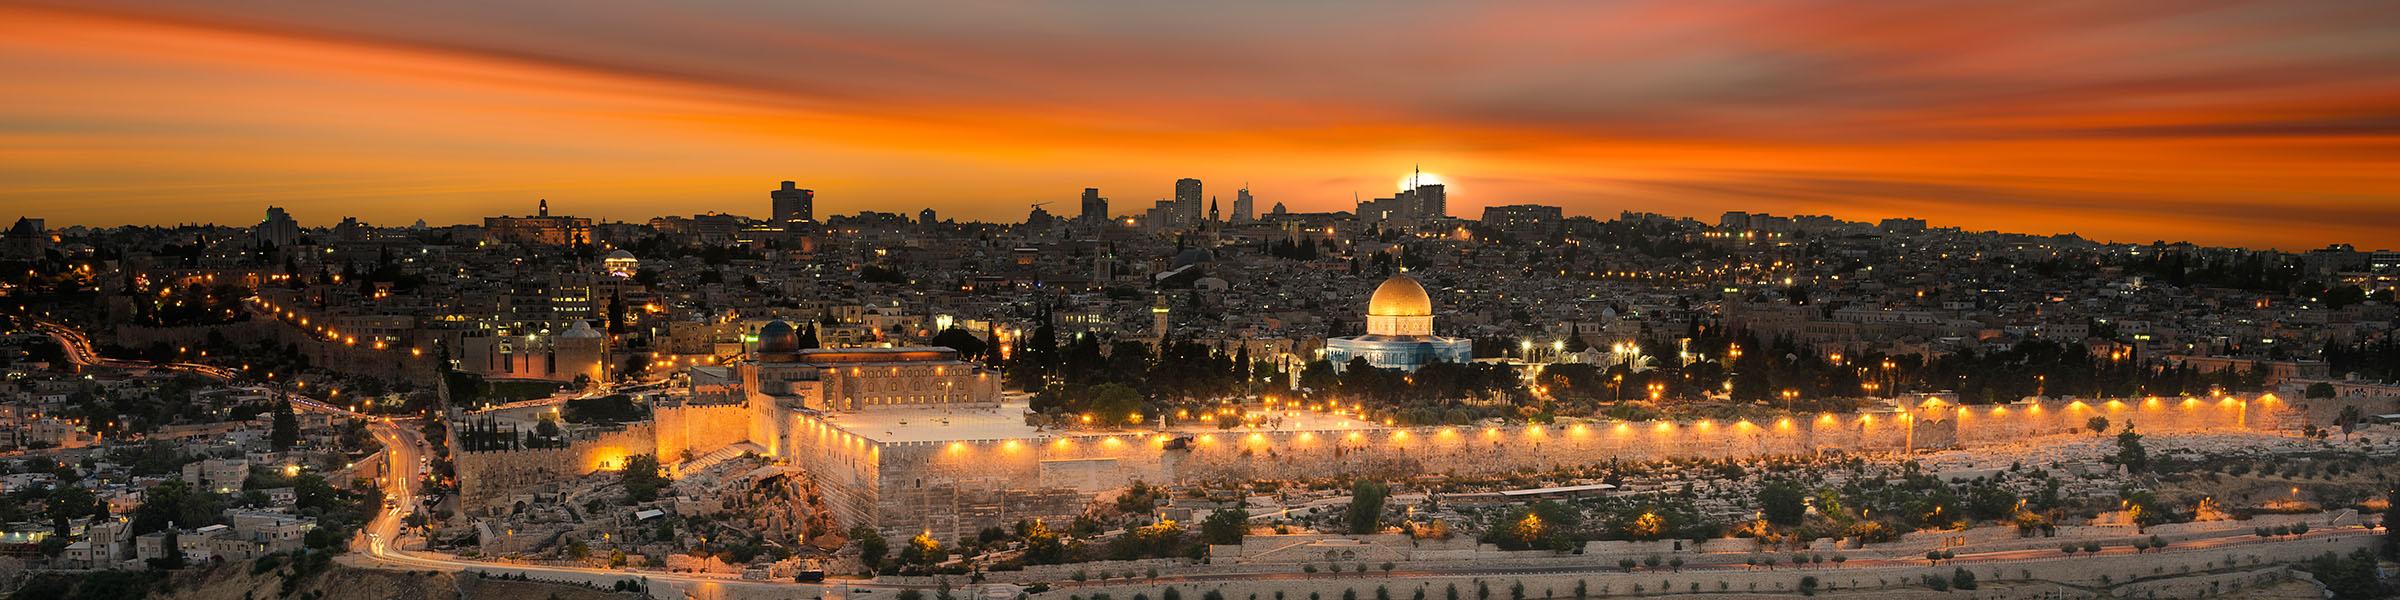 Israel Jerusalem Old City